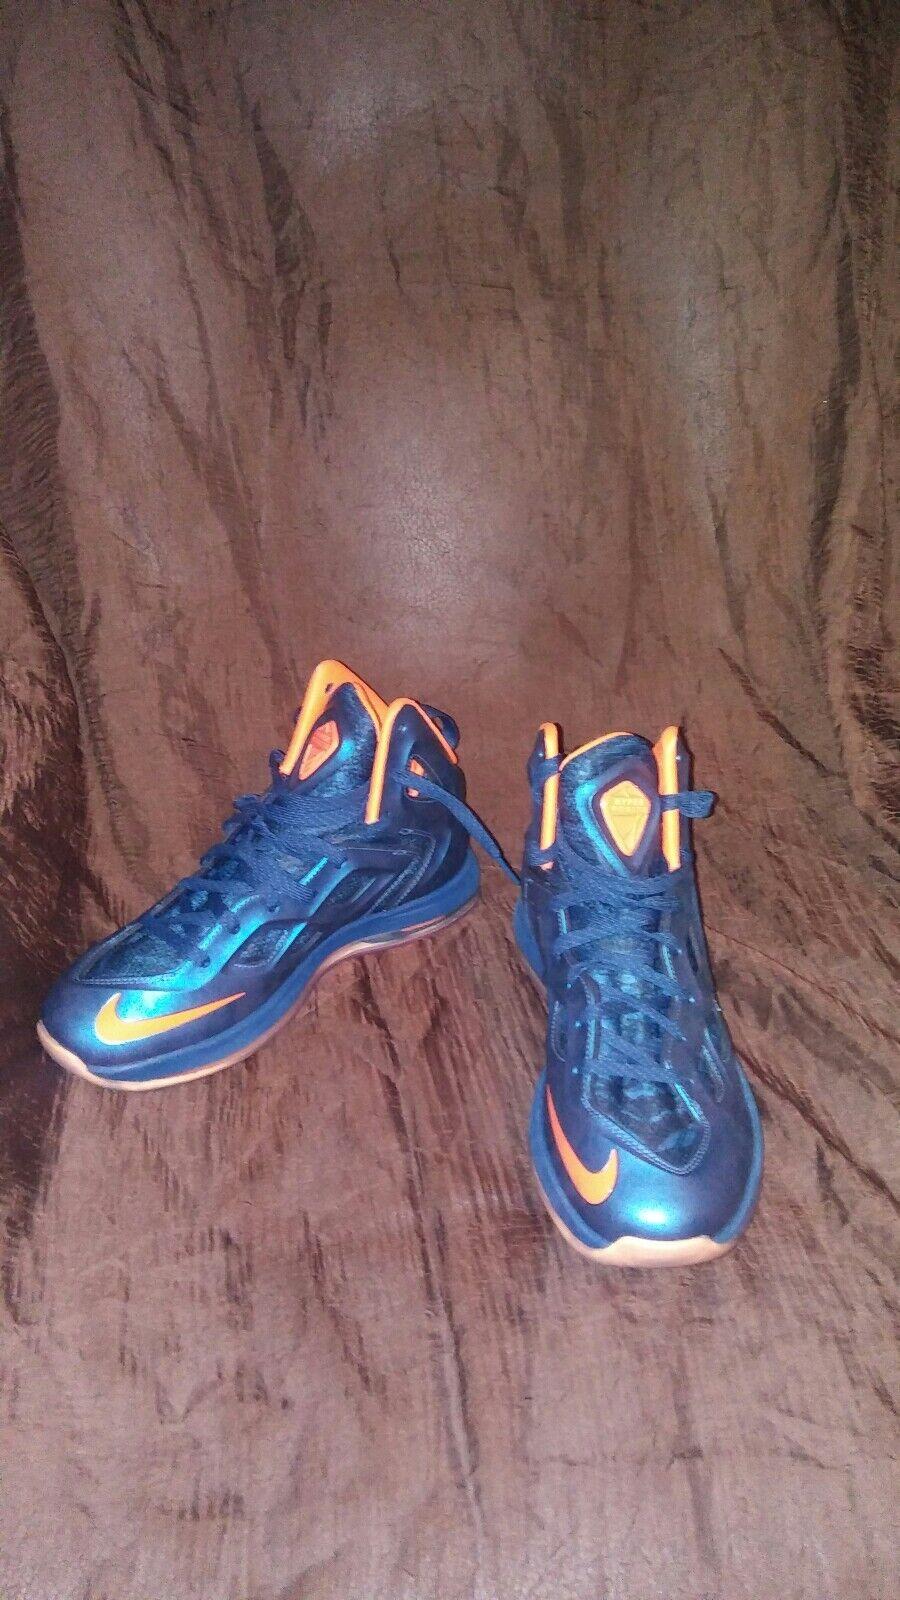 Cheap women's shoes women's shoes NEW MEN'S SIZE 9.5 Nike HYPERPOSITE Shoes